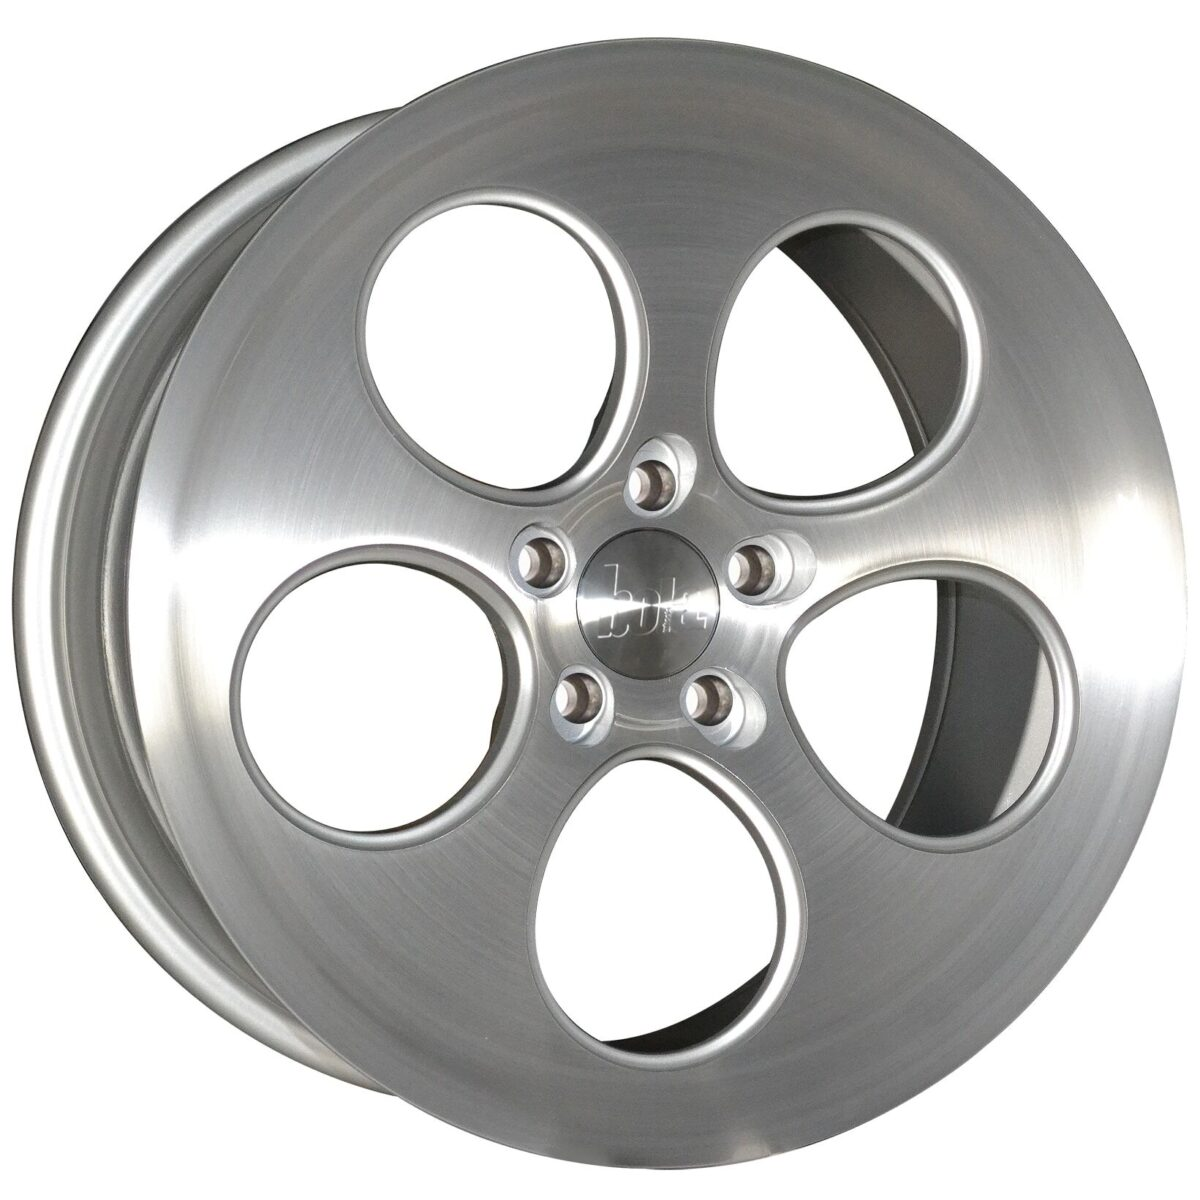 "18"" BOLA B5 Wheels - Silver Brushed Polished Face - VW / Audi / Mercedes - 5x112"